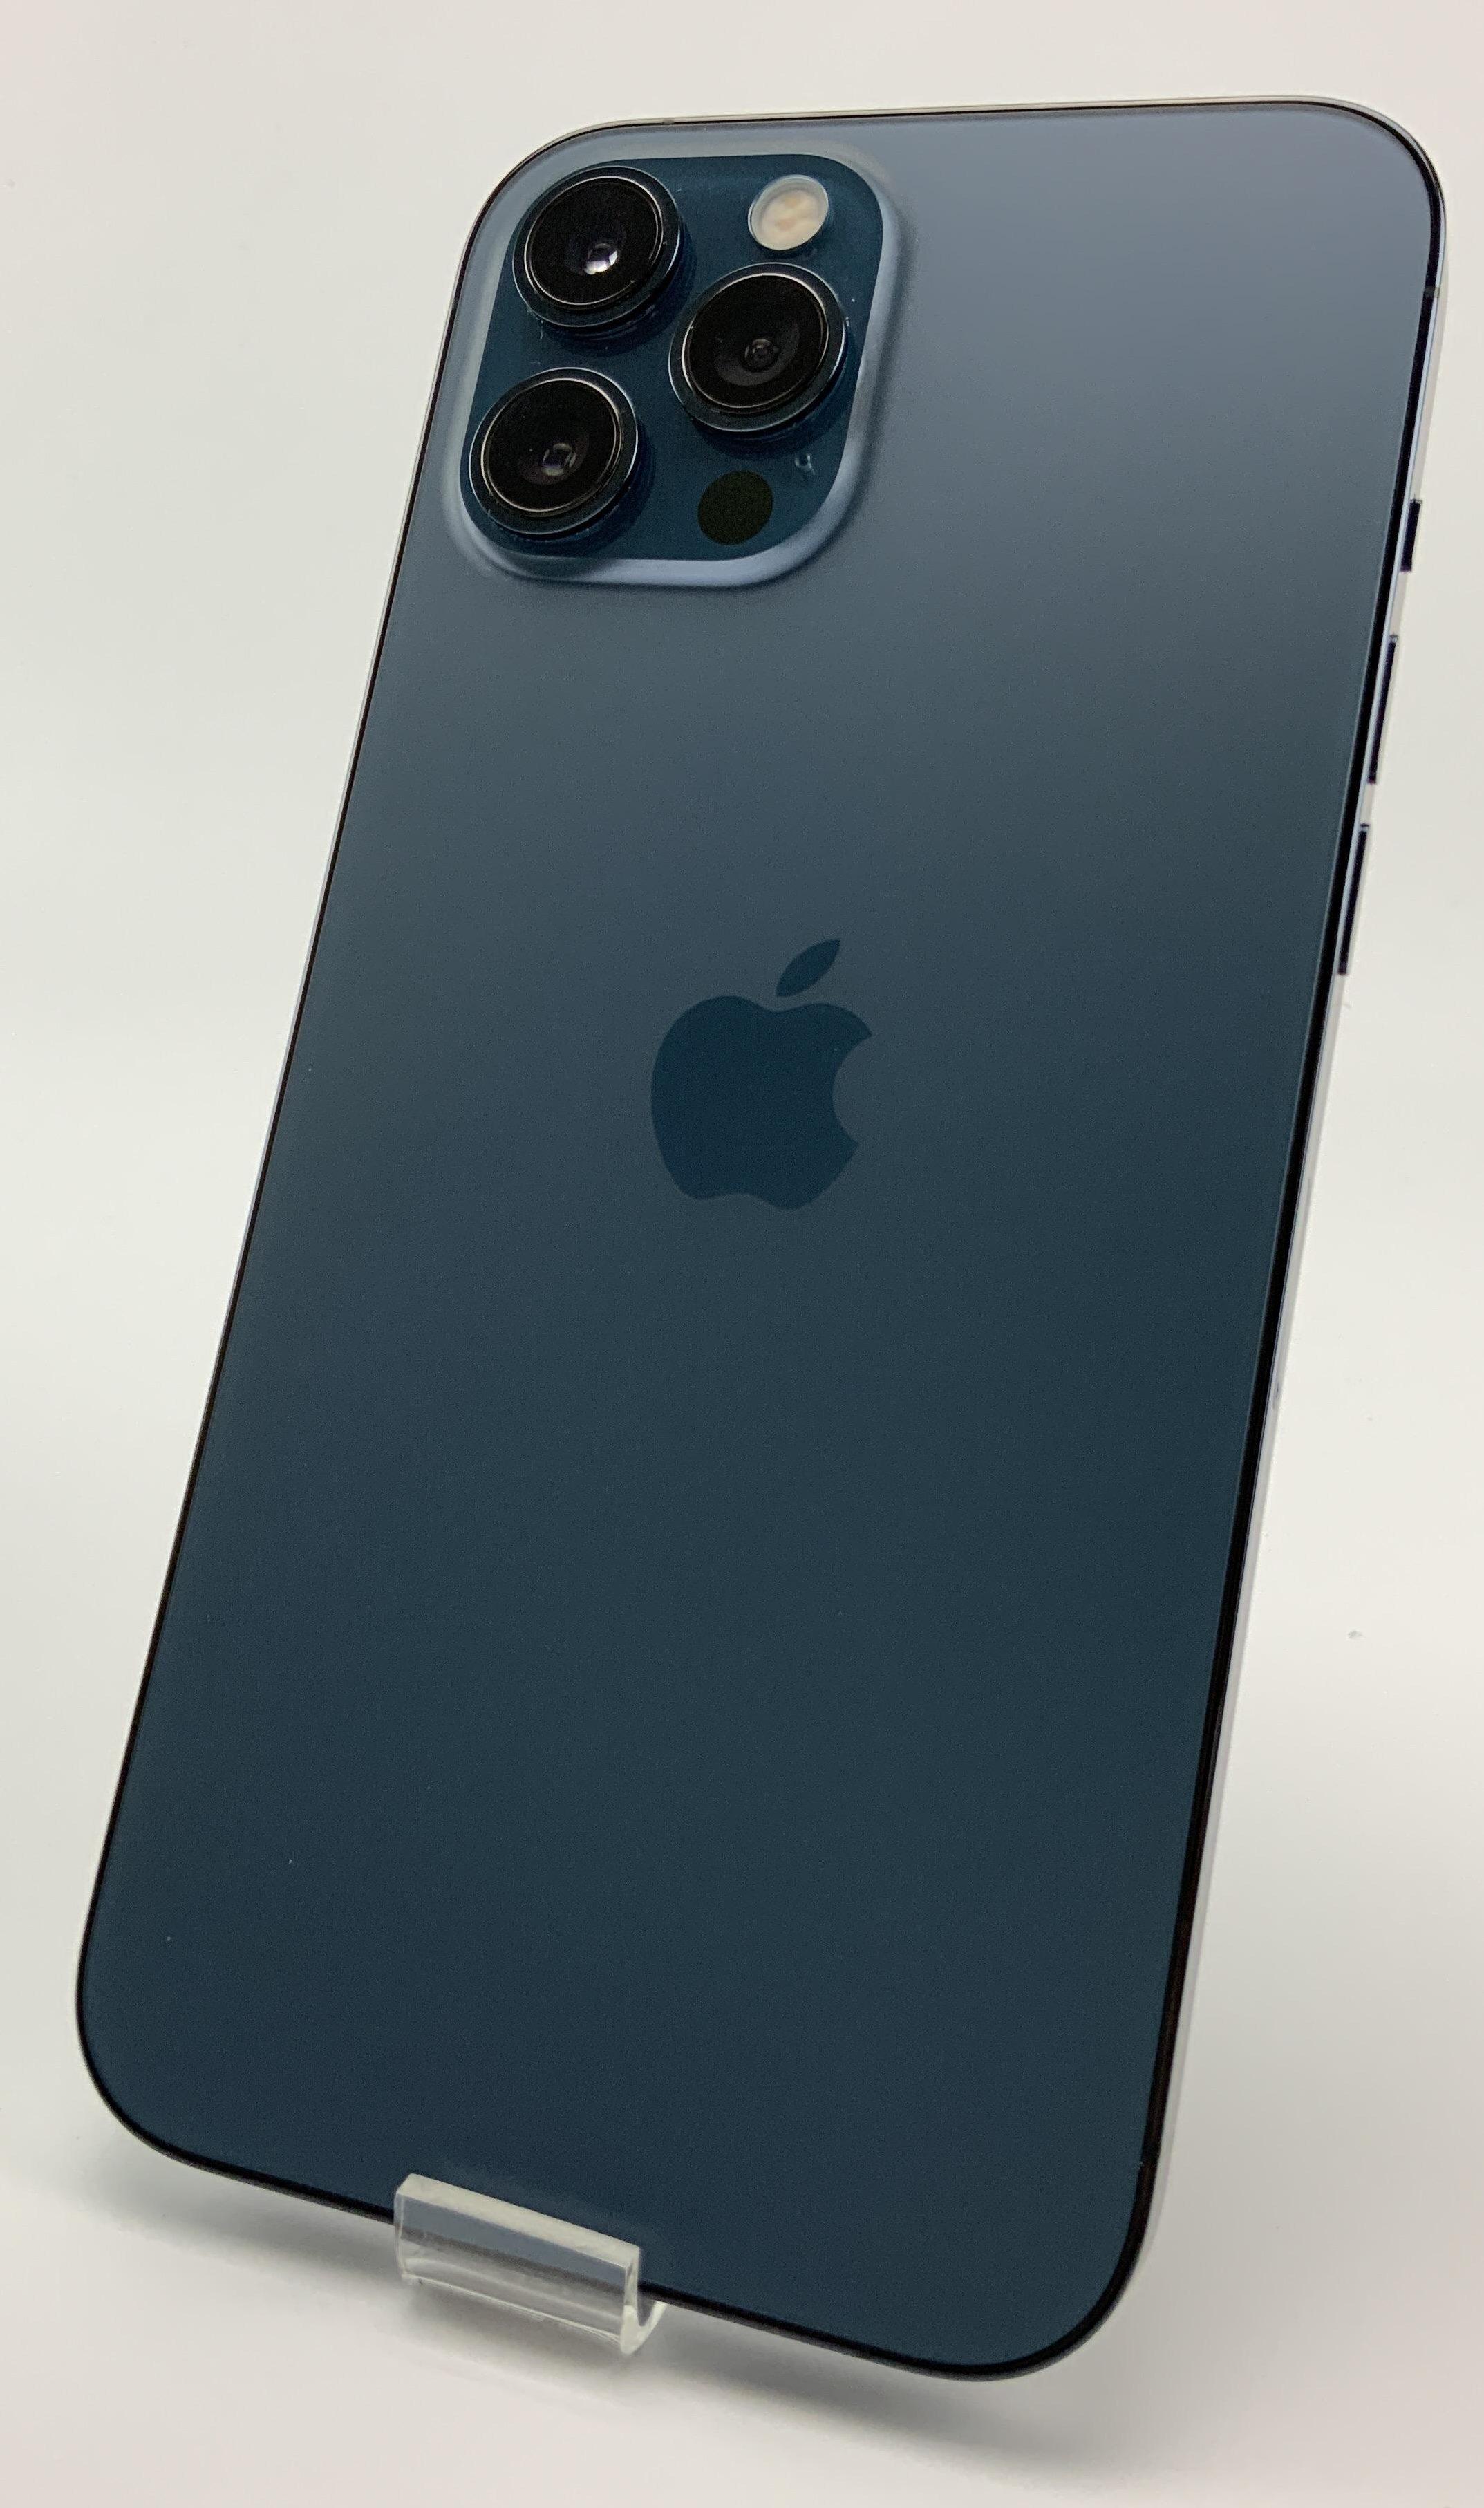 iPhone 12 Pro Max 256GB, 256GB, Pacific Blue, Bild 2